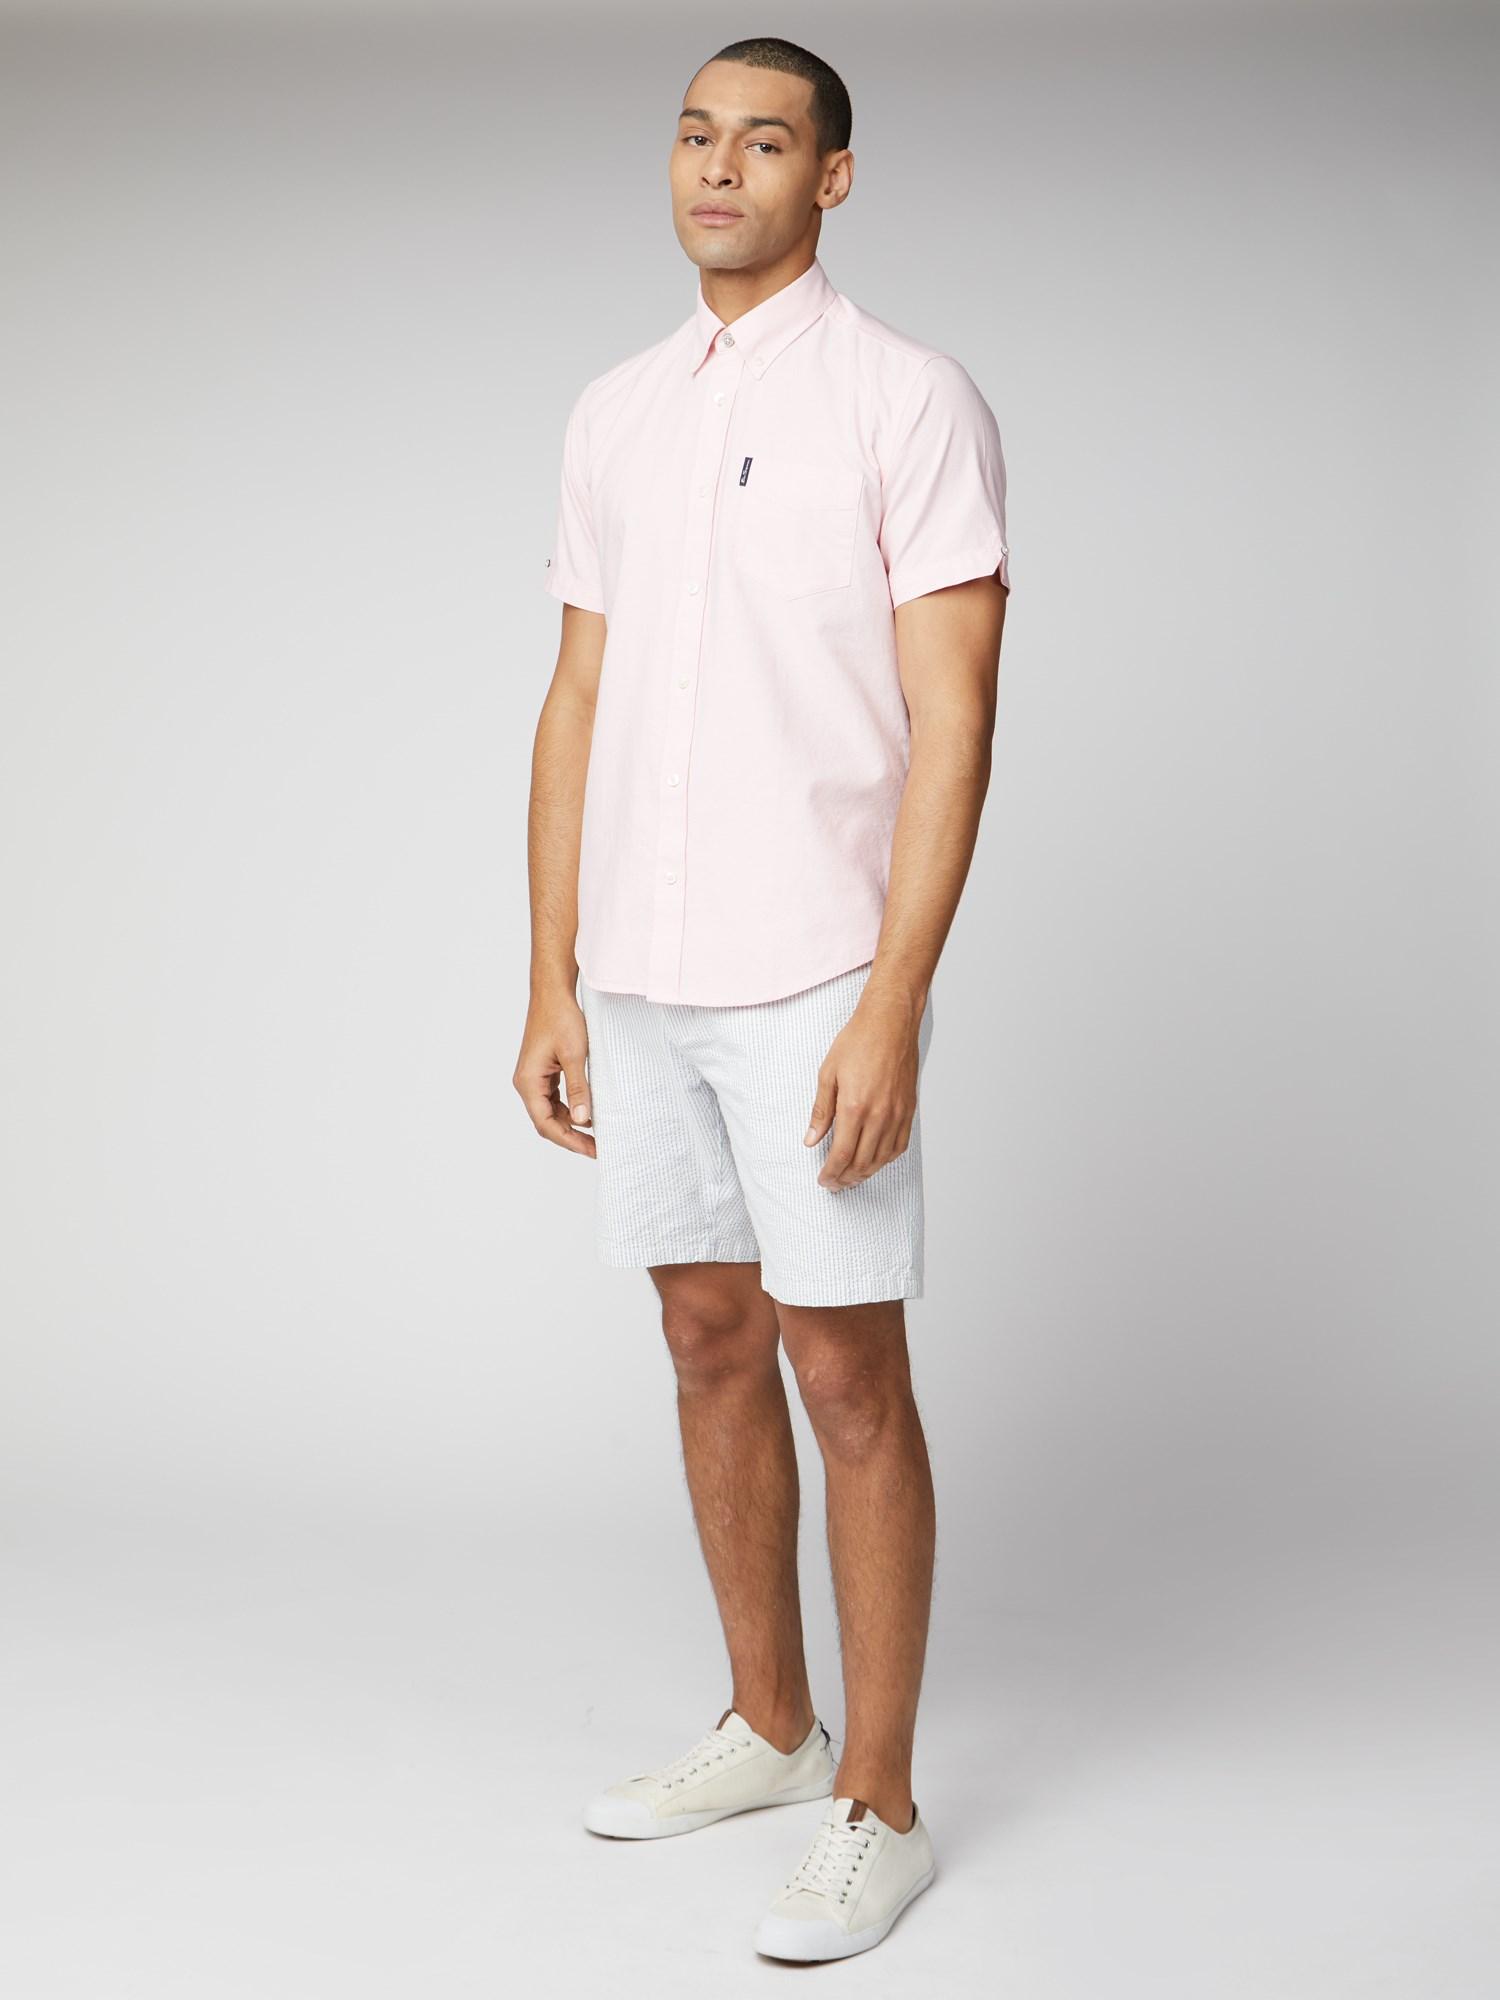 Signature Light Pink Button Down Oxford Shirt